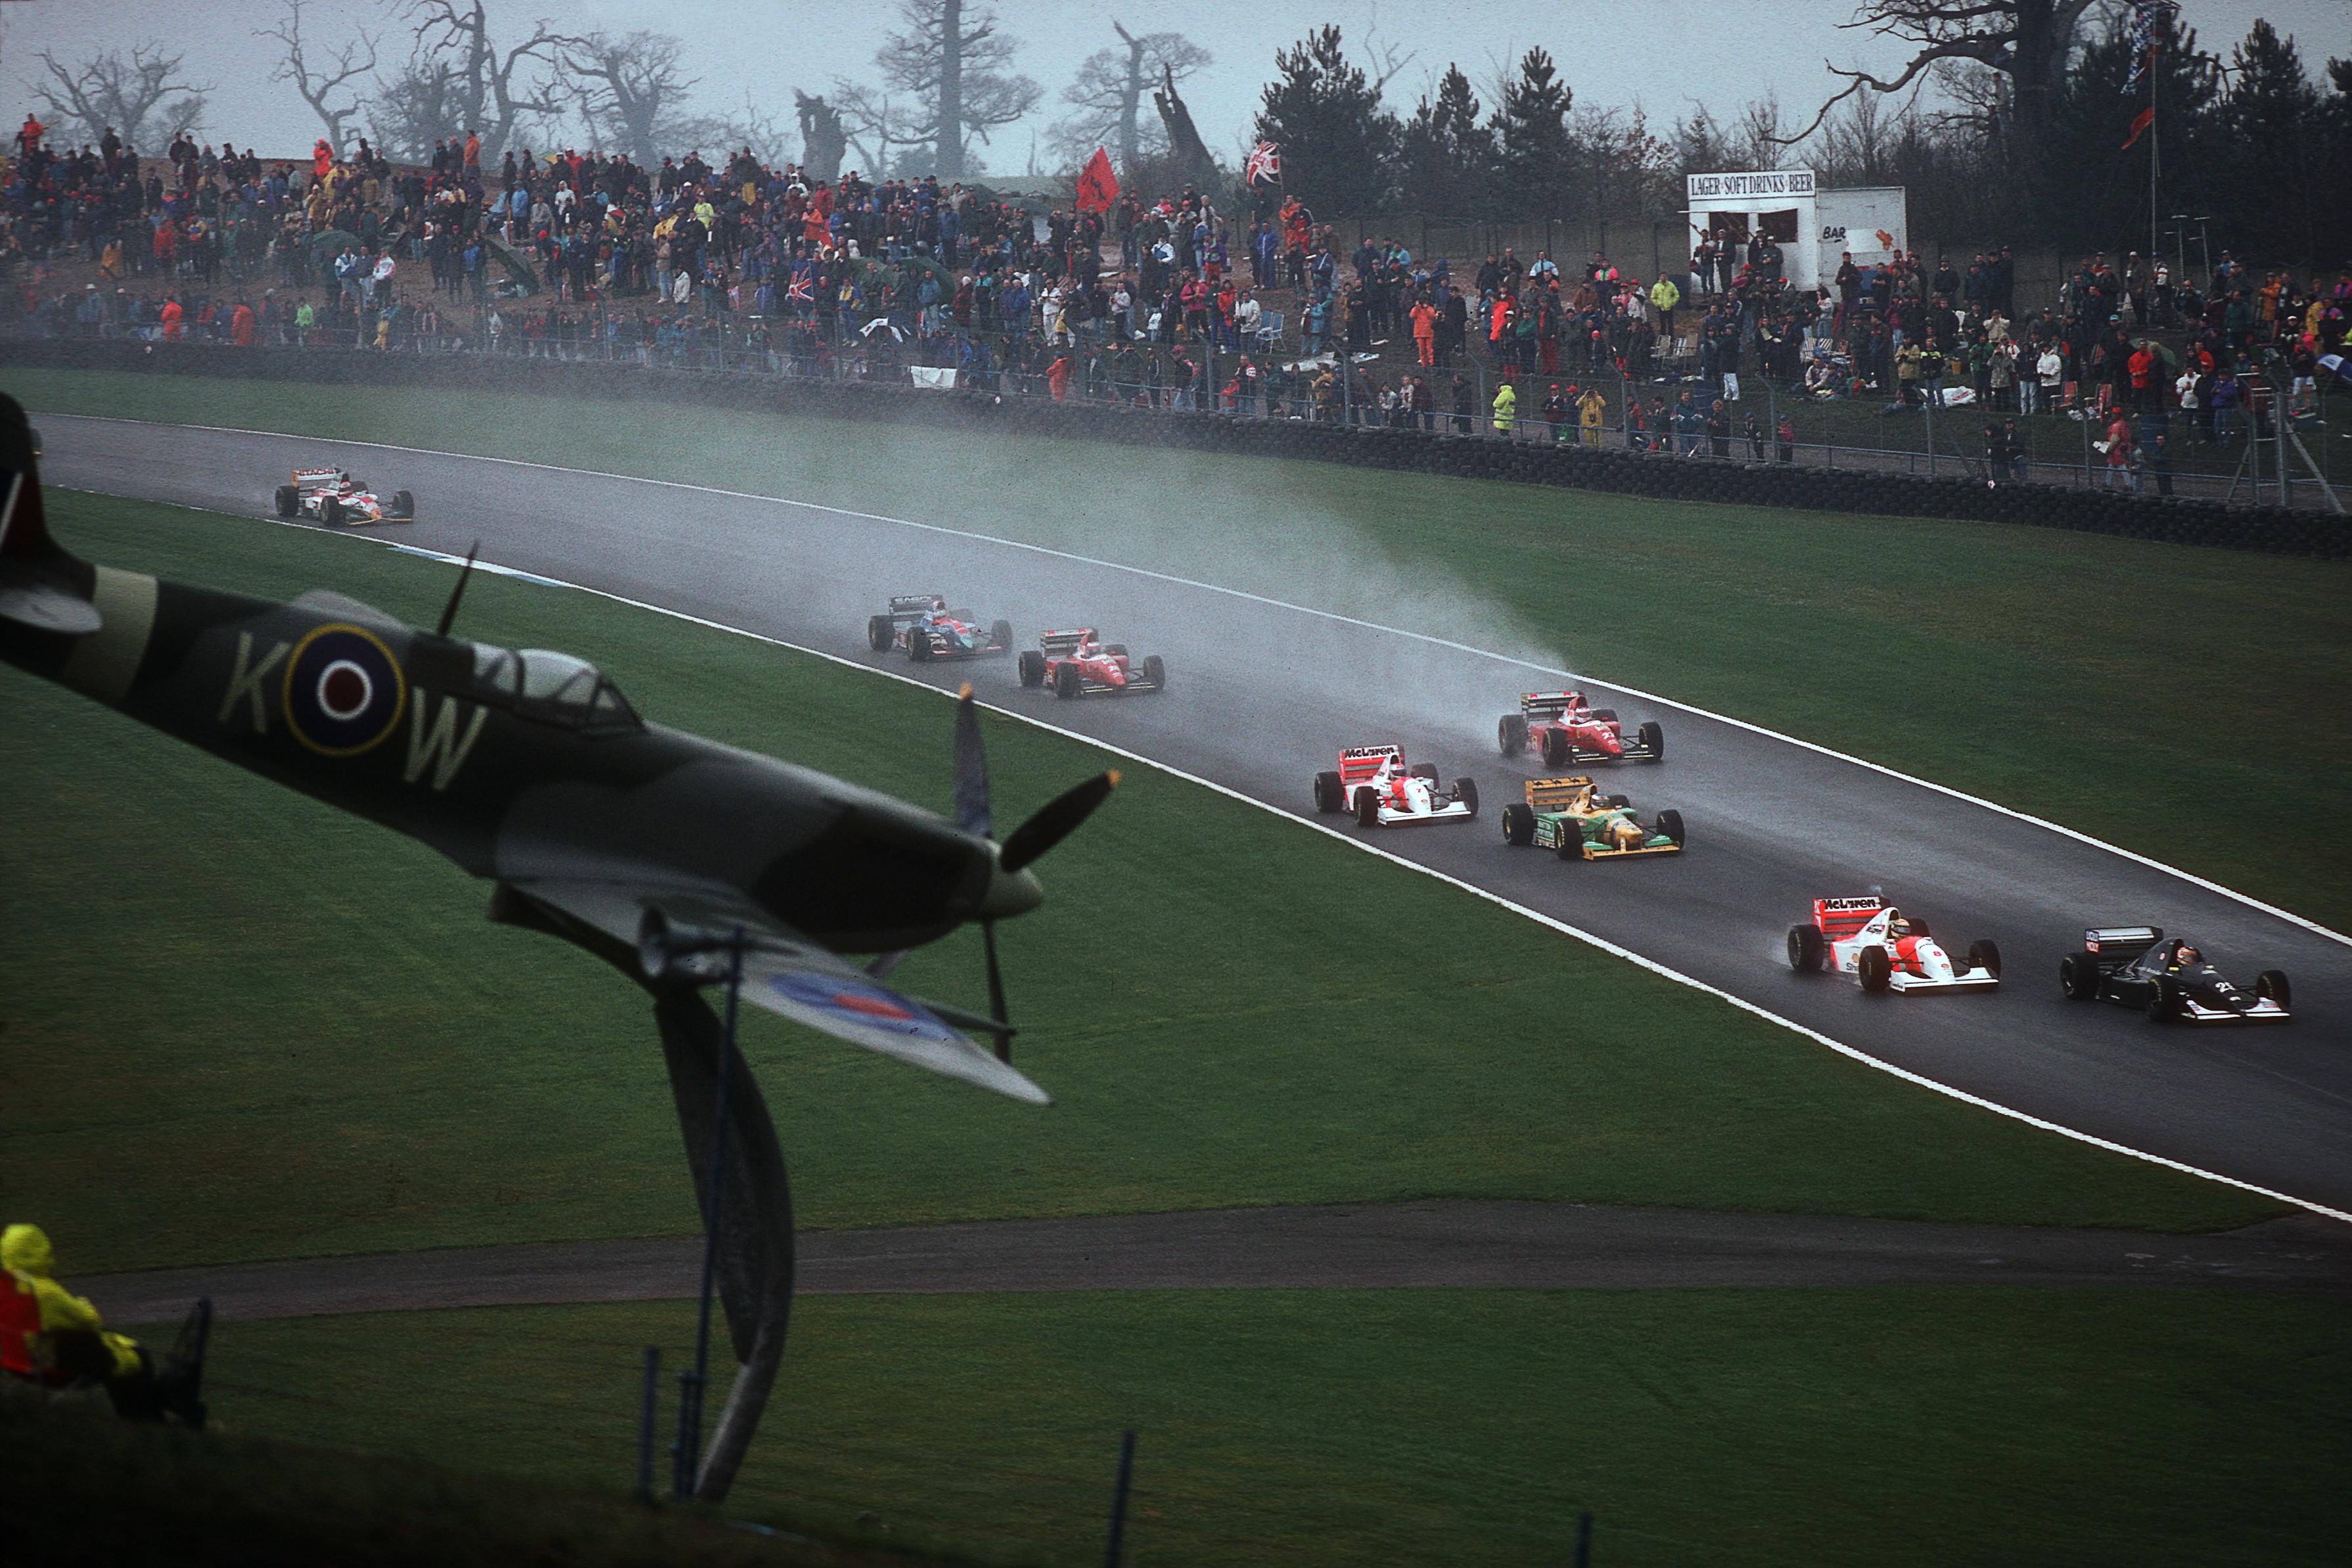 Ayrton Senna (McLaren) au Grand Prix d'Europe 1993